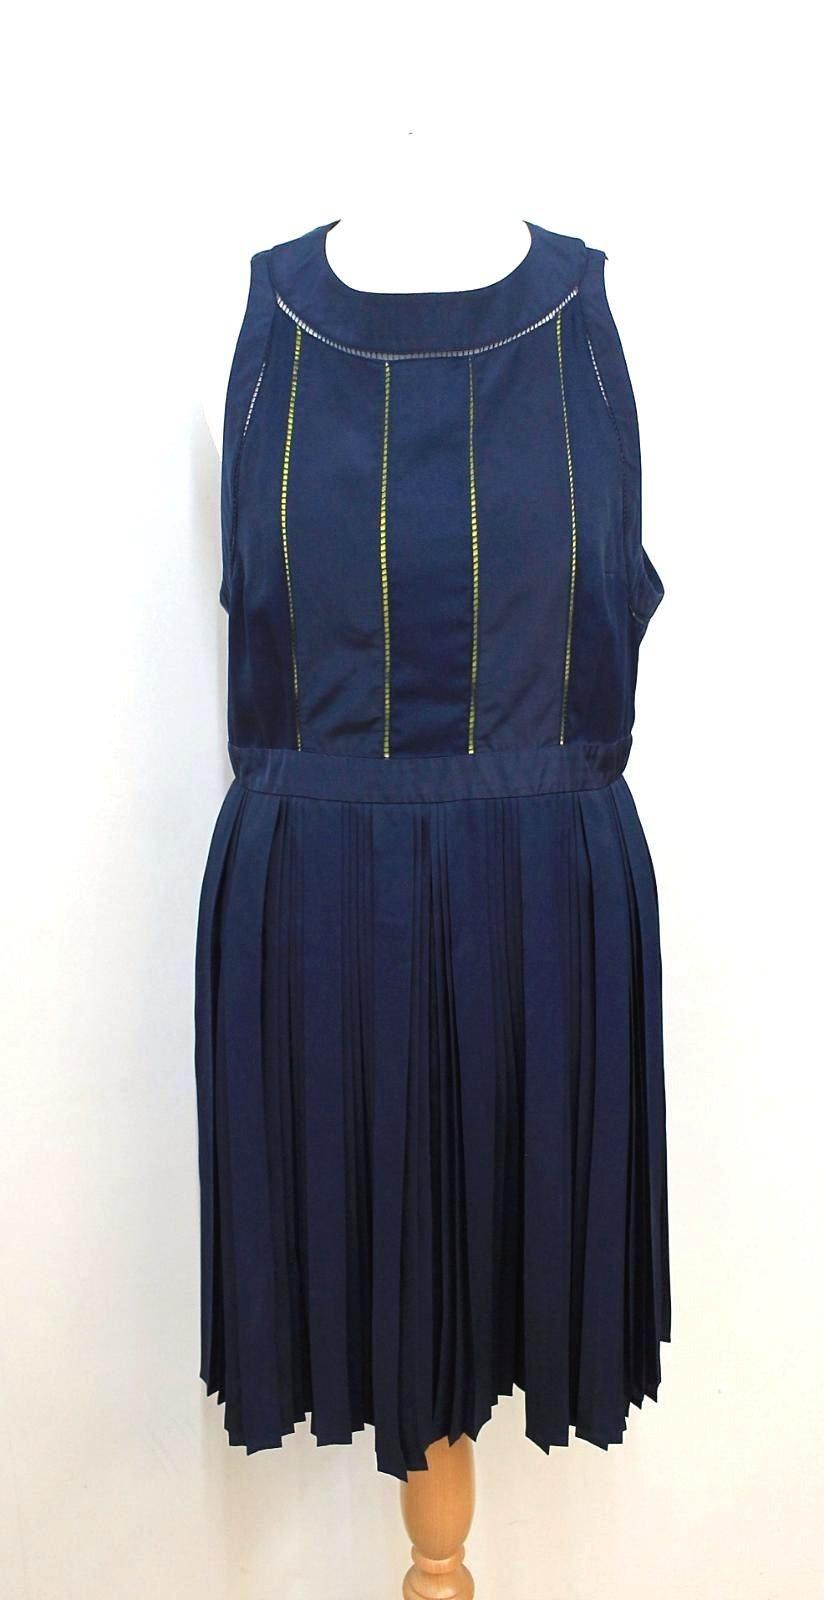 KENZO PARIS Ladies Navy Blue Neon Yellow Sleeveless Shift Dress FR42 UK14